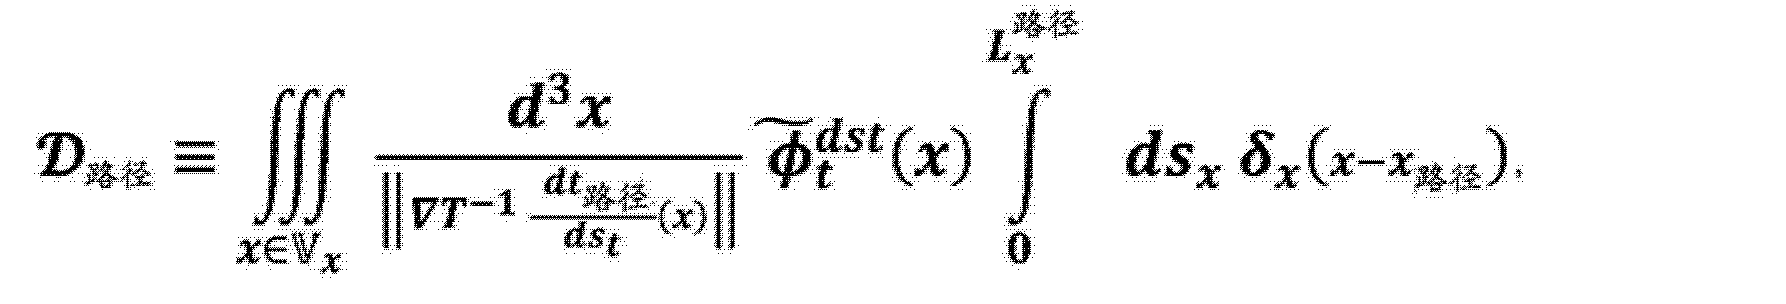 Figure CN104282036AD00362